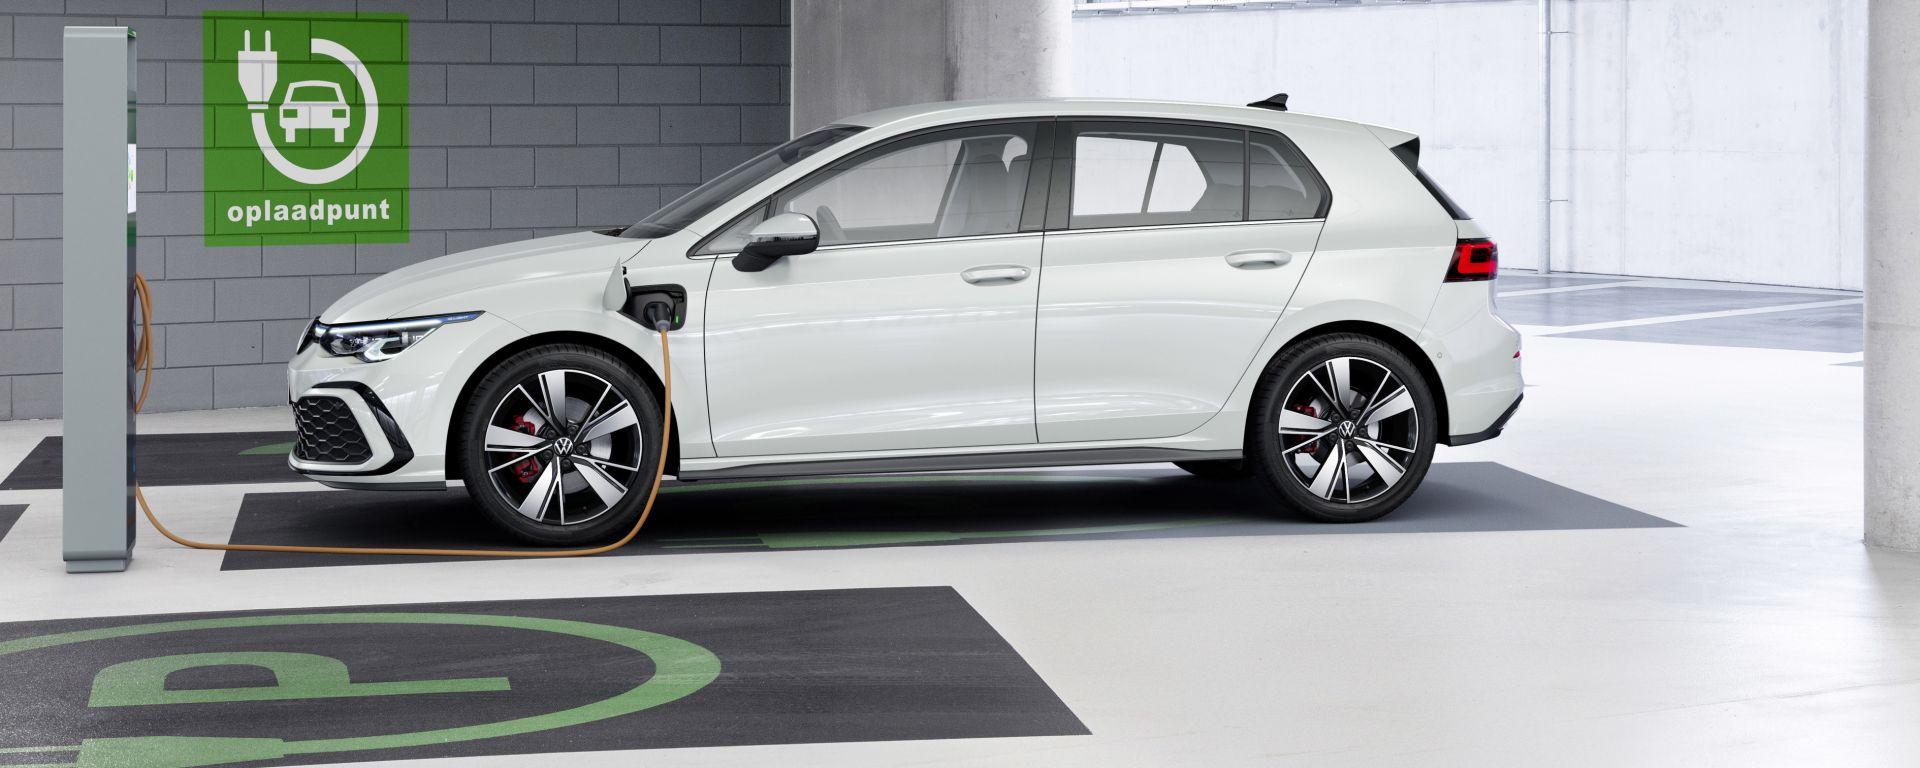 Nuova Volkswgen Golf GTE plug-in hybrid: vista laterale